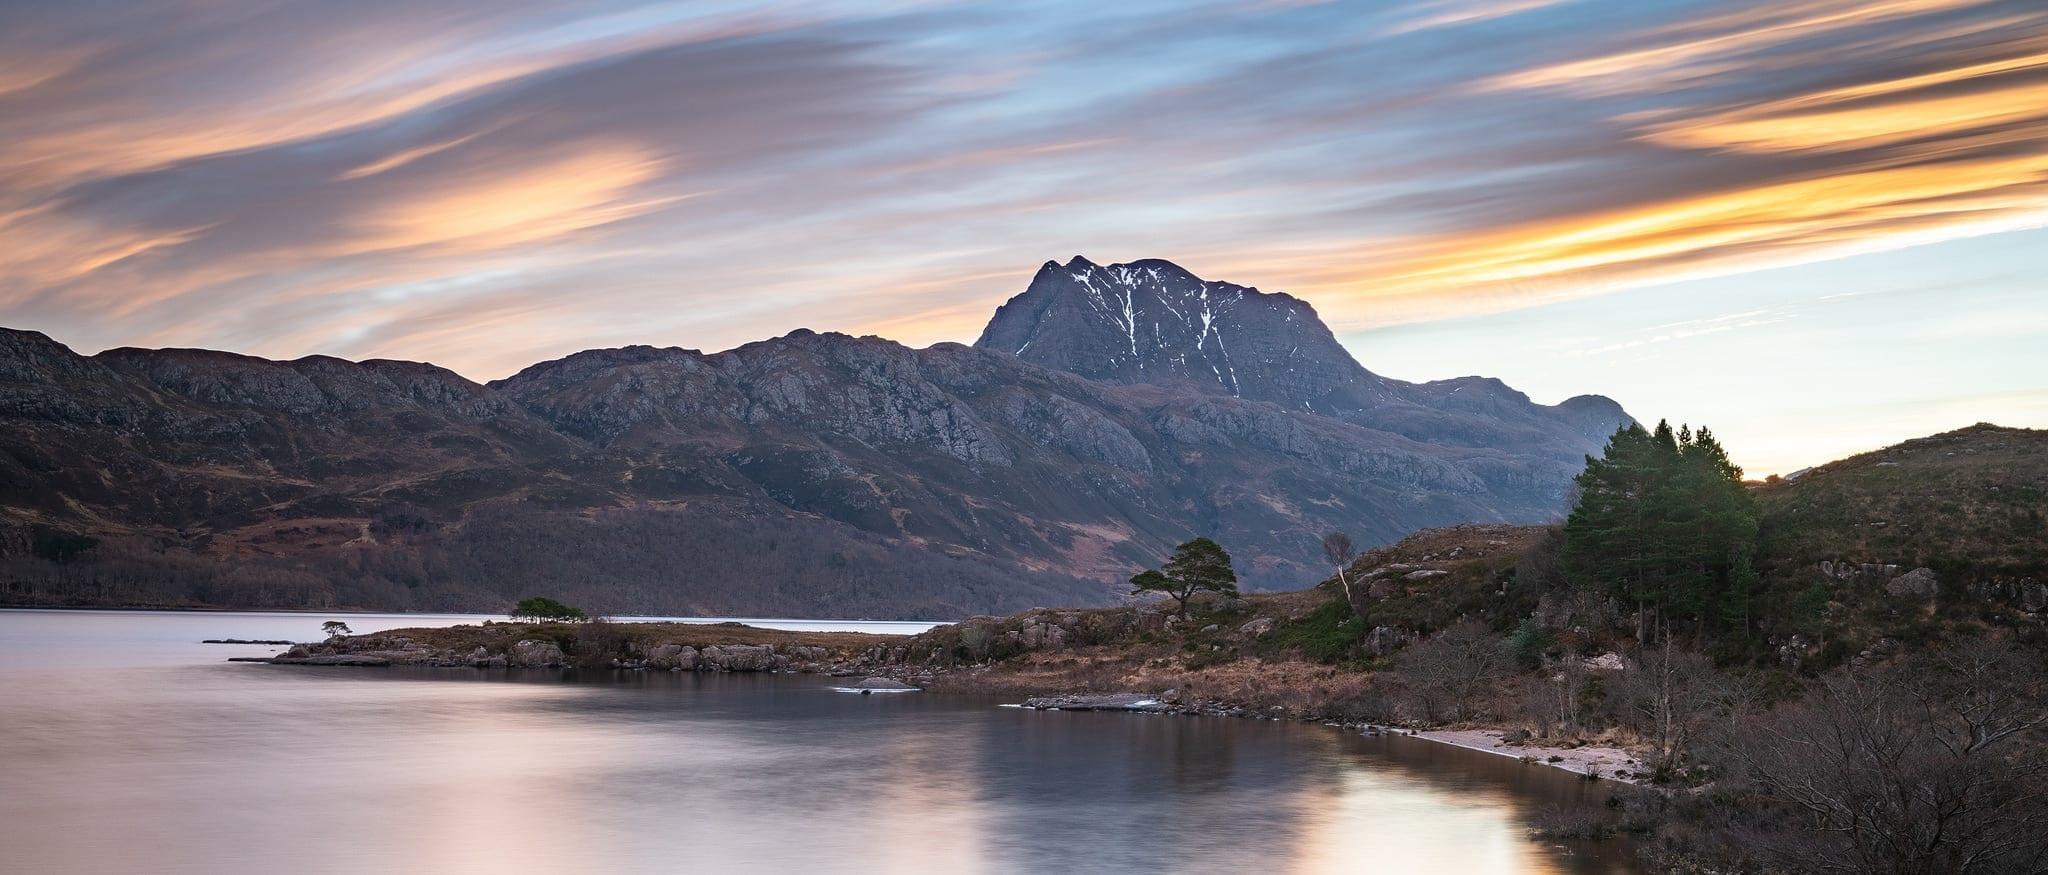 Slioch and Loch Maree Sunrise - Scotland Landscape Photography